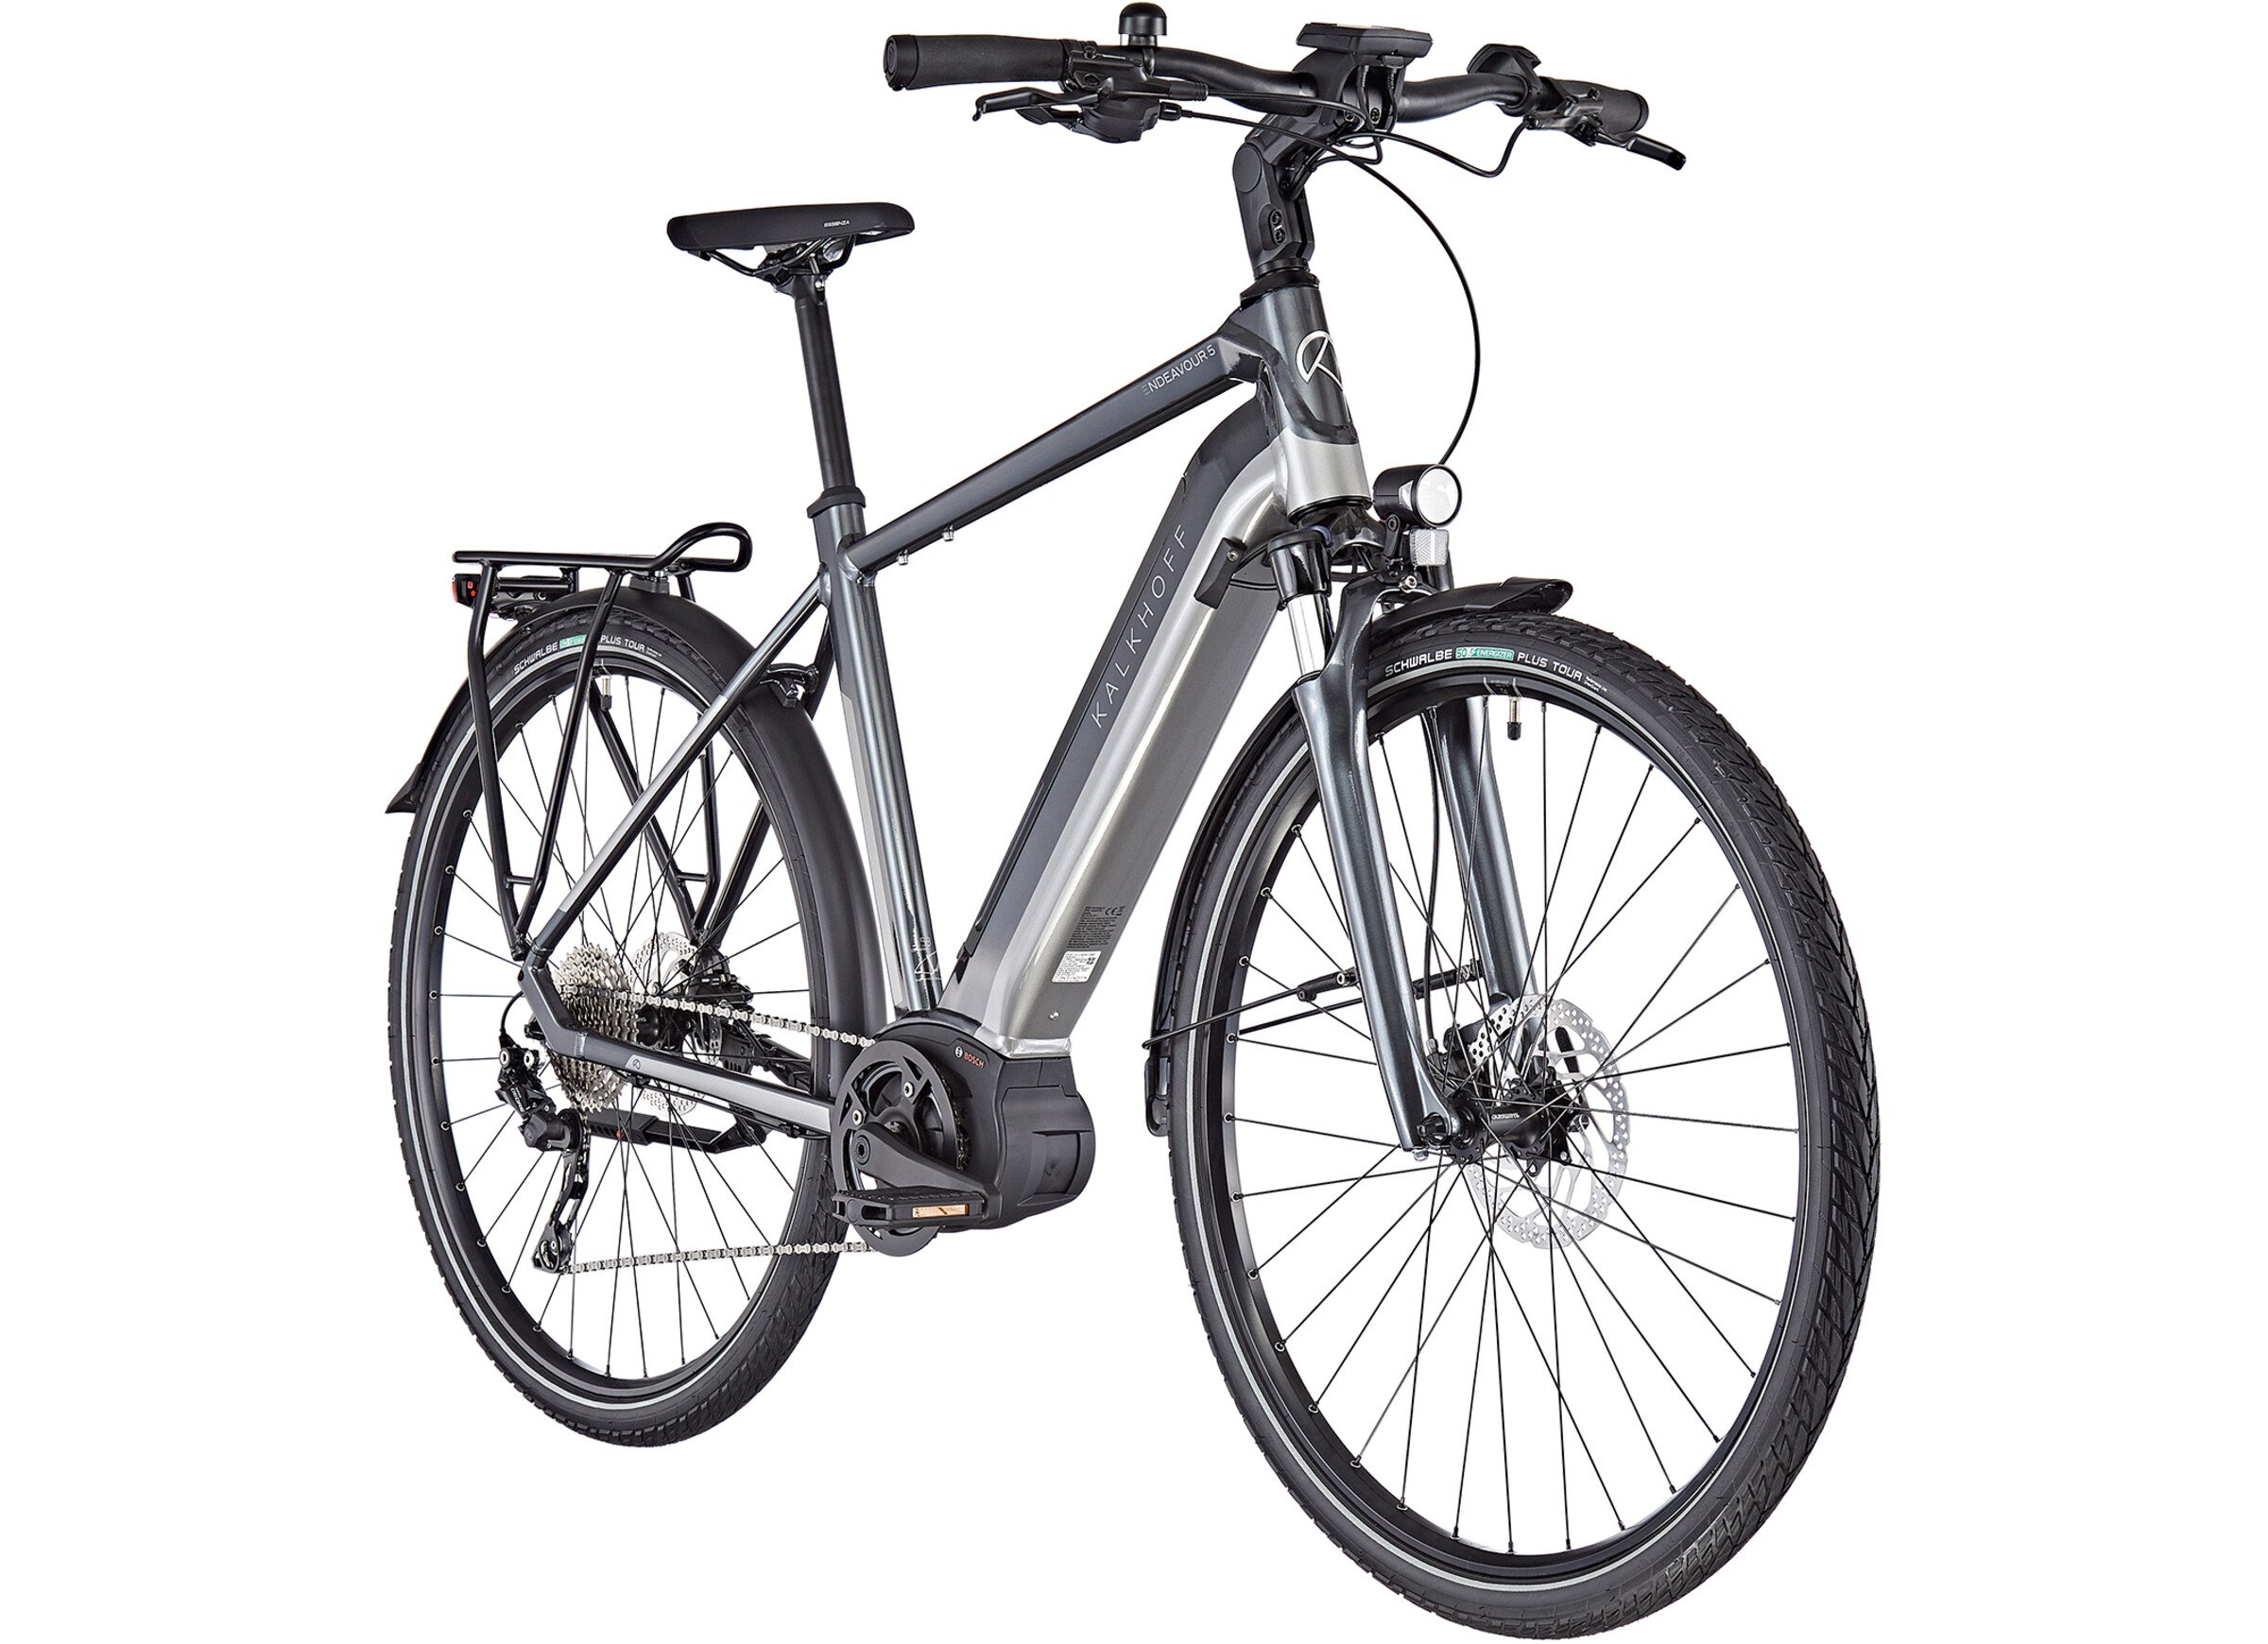 Kalkhoff Endeavour 5.B Move Diamond Frame e-Bike